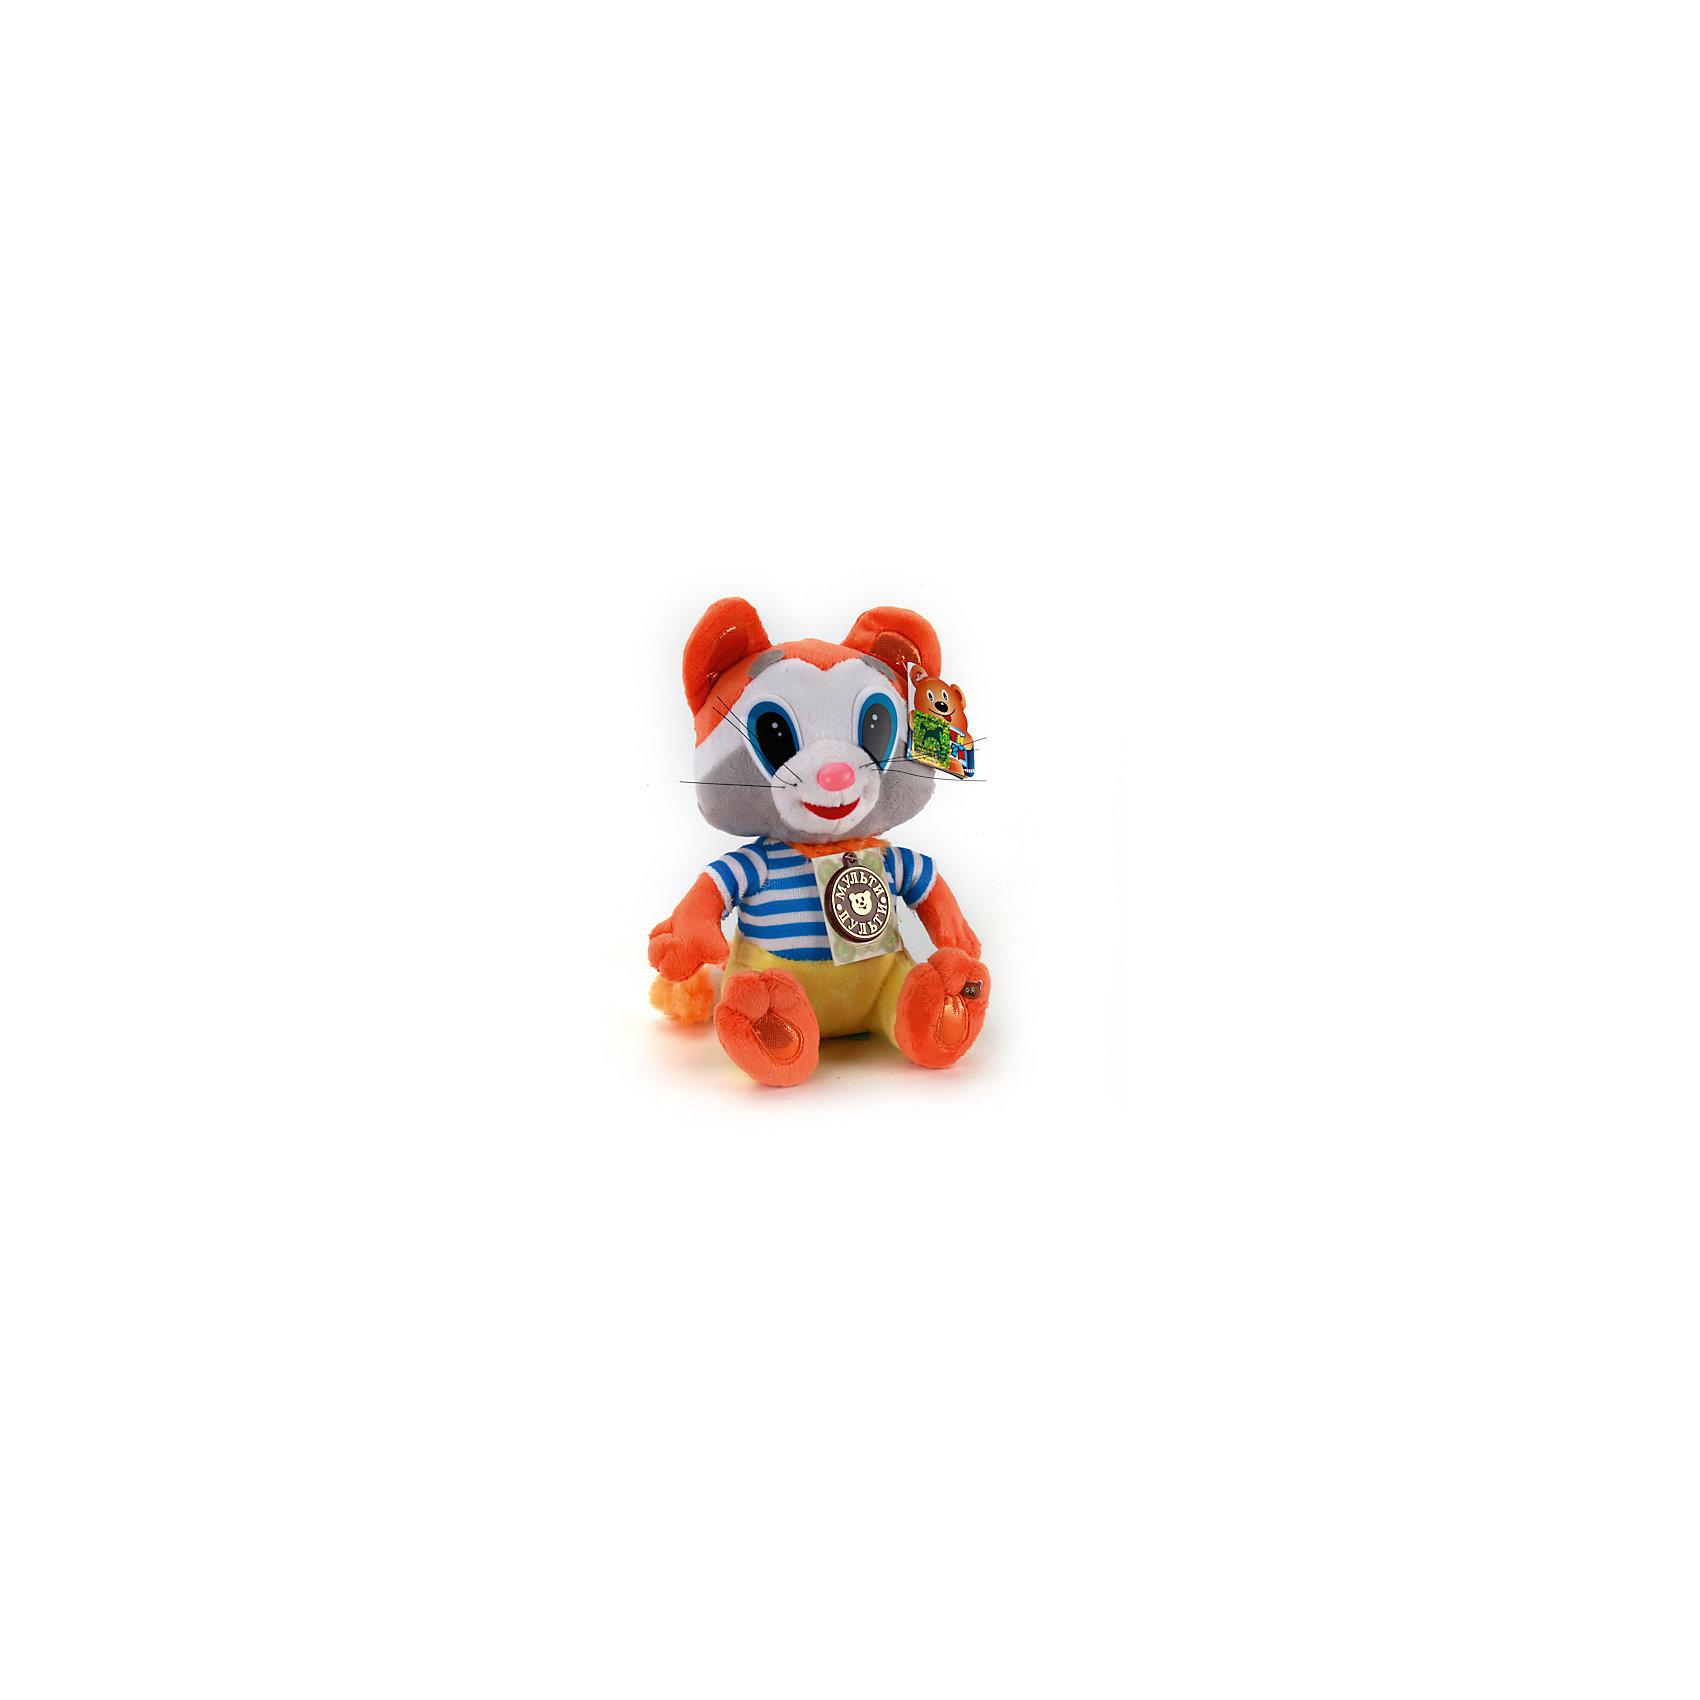 МУЛЬТИ-ПУЛЬТИ Мягкая игрушка Крошка енот, 18см, со звуком, Мульти-пульти мульти пульти мягкая игрушка эдди 18 см со звуком пингвиненок пороро мульти пульти